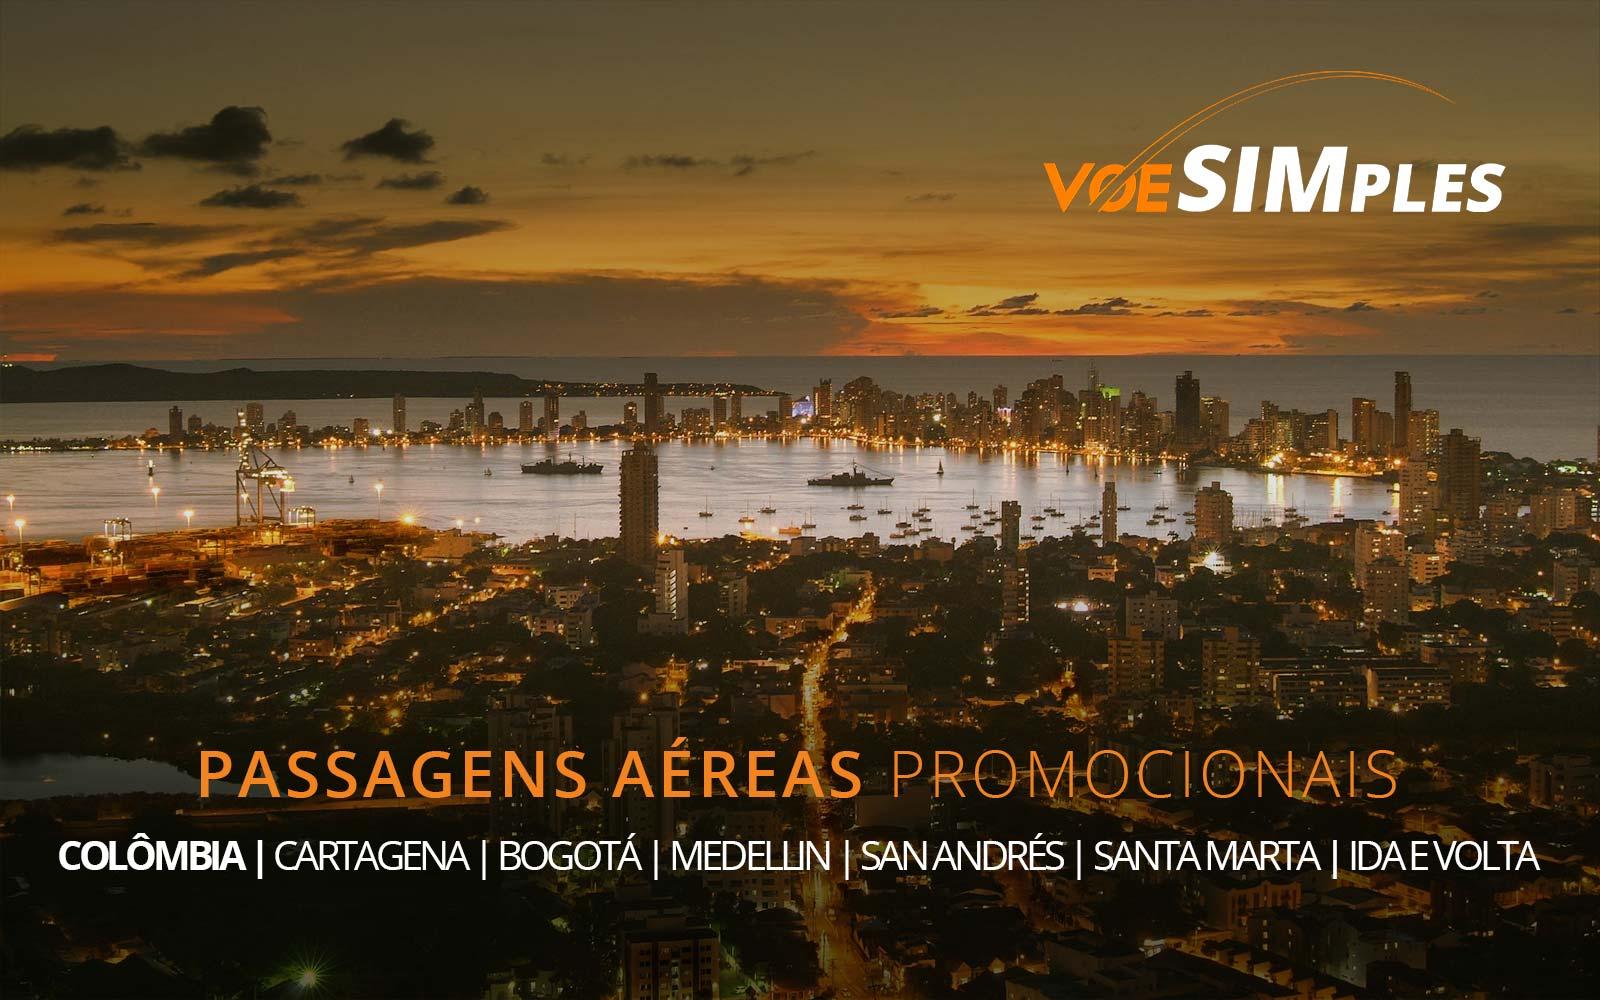 Promoção de passagens aéreas para Bogotá, Cartagena, Medellín, San Andrés e Santa Marta na Colômbia